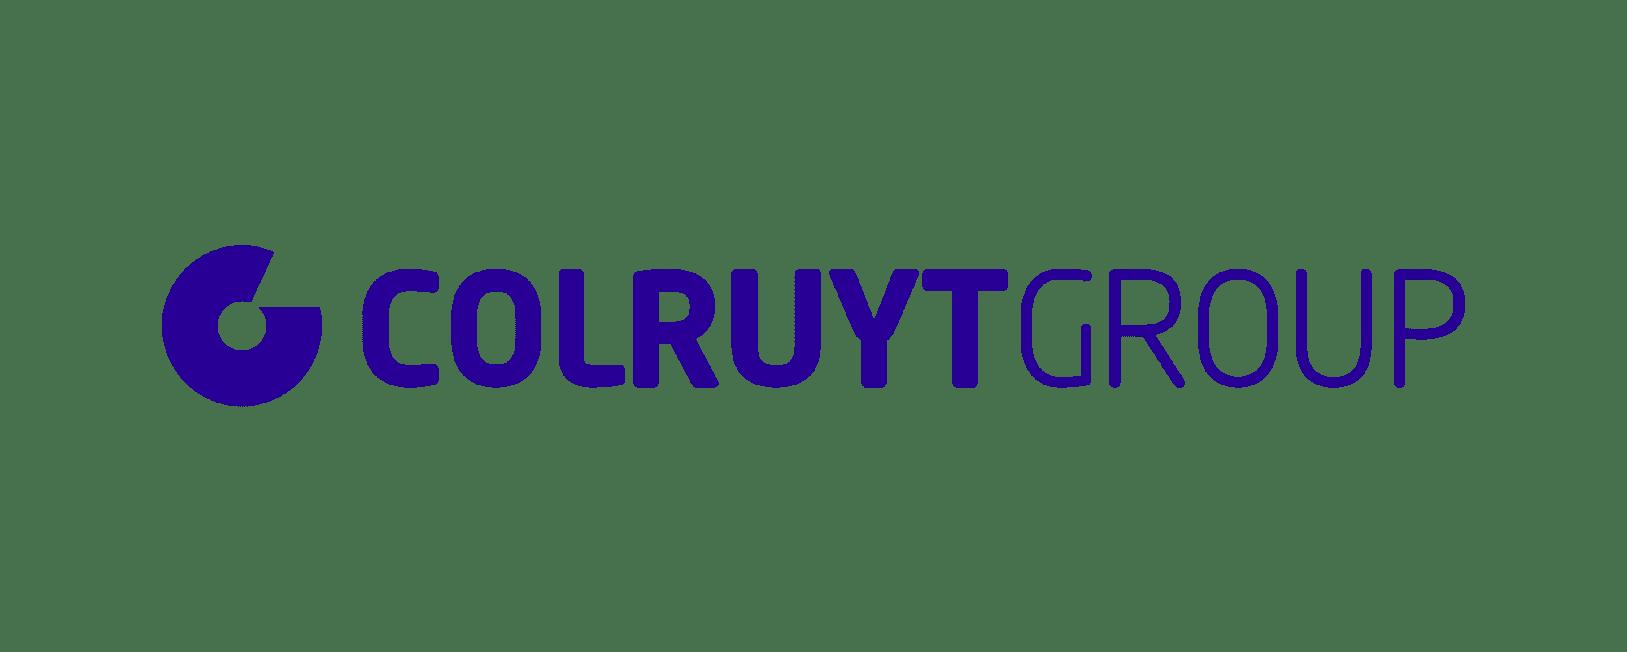 colruyt_groep_logo